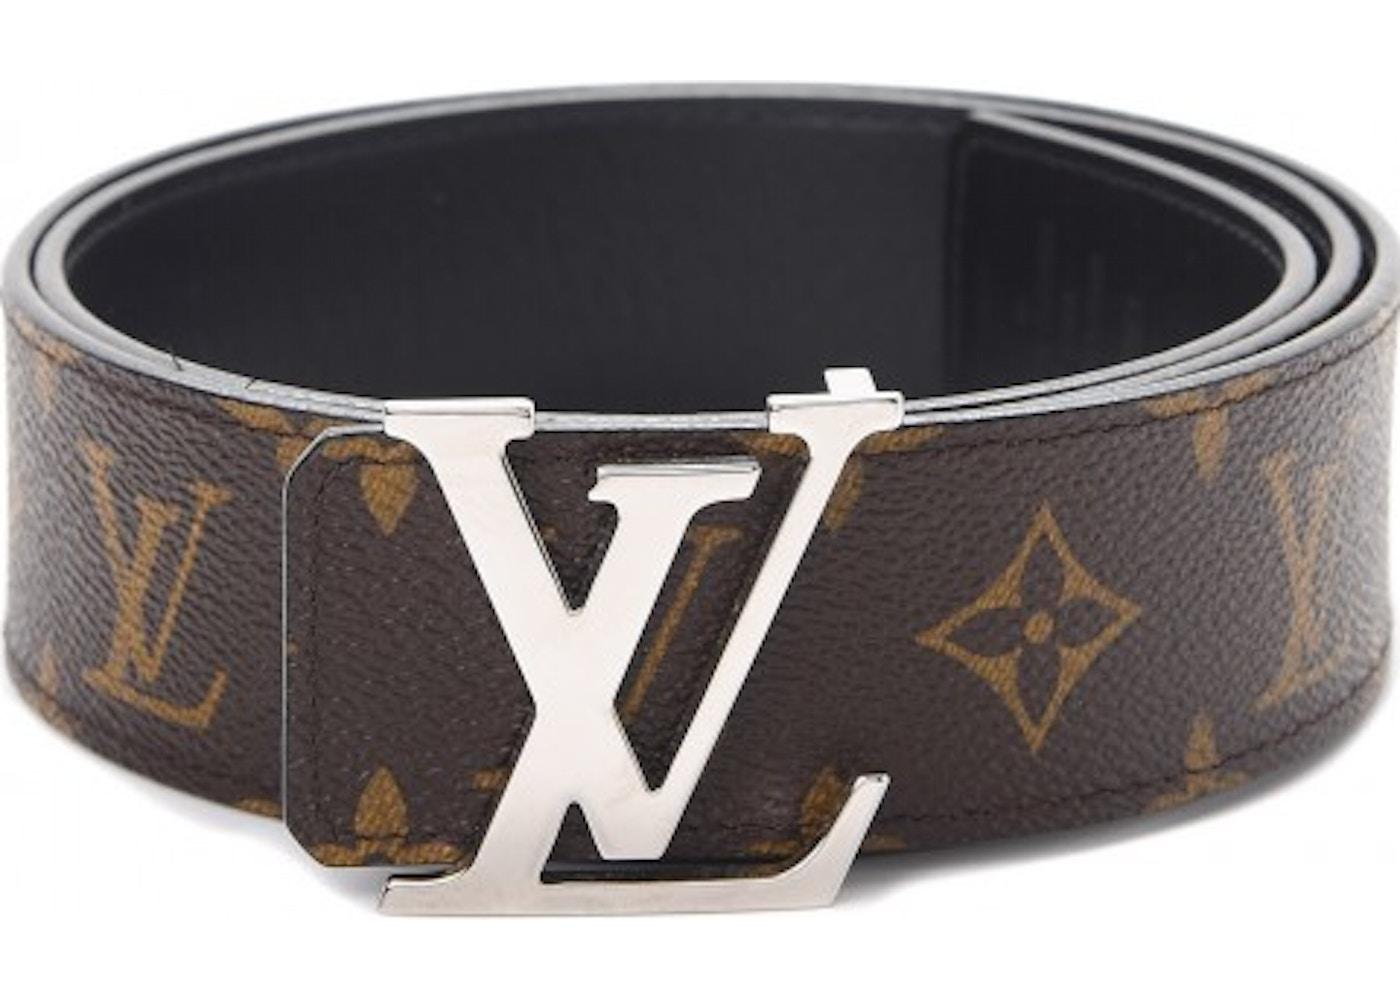 4dbc45c2ec6 Louis Vuitton Belt LV Initiales Reversible 1.5 Width Monogram Noir  Black/Brown